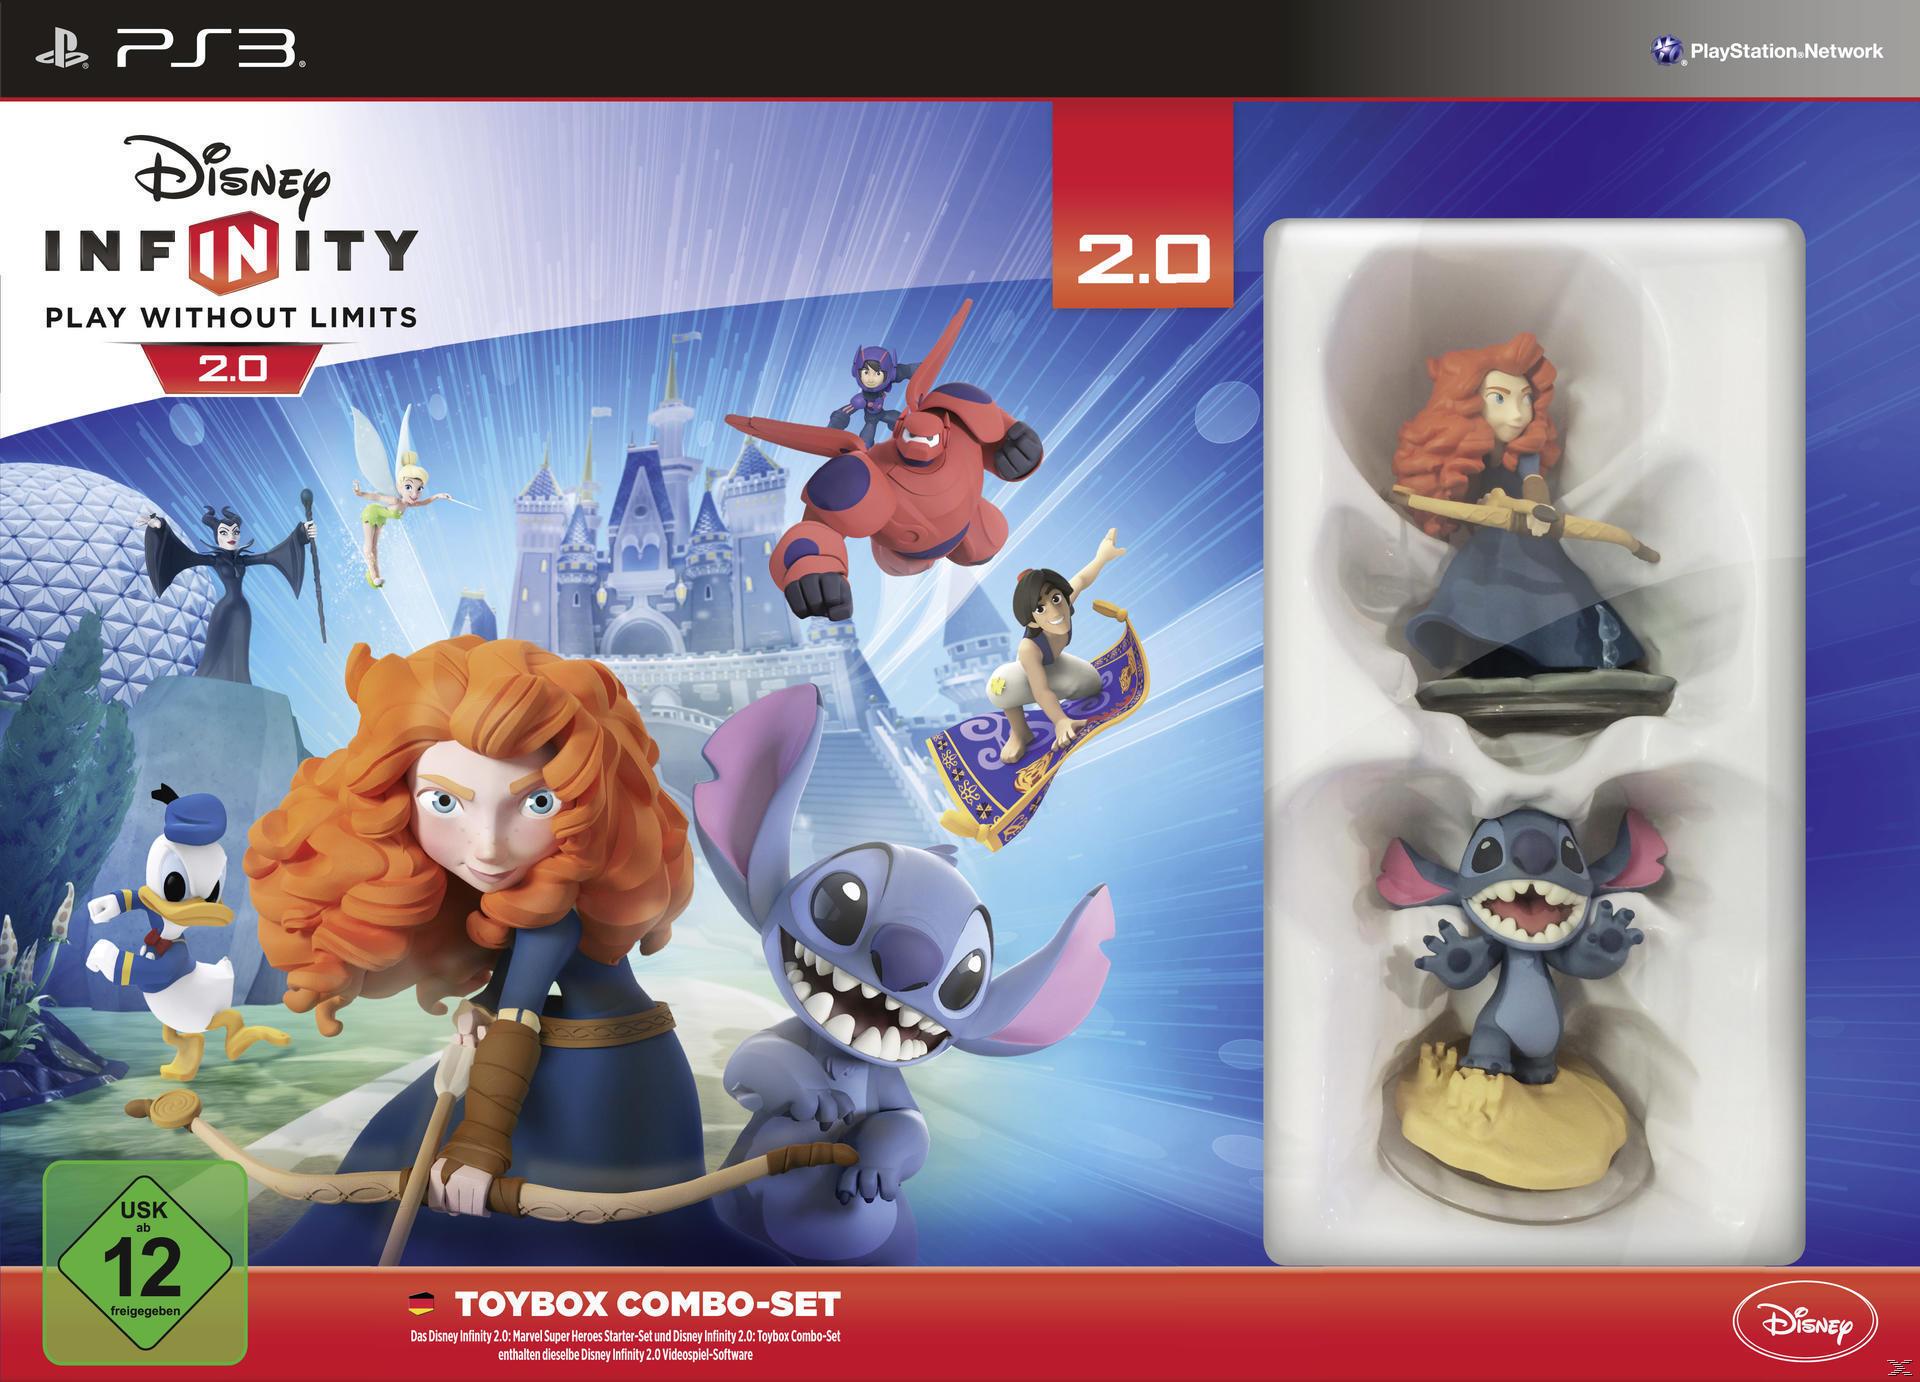 Disney Infinity 2.0: Toybox Combo-Set (Playstation3) für 5,00 Euro